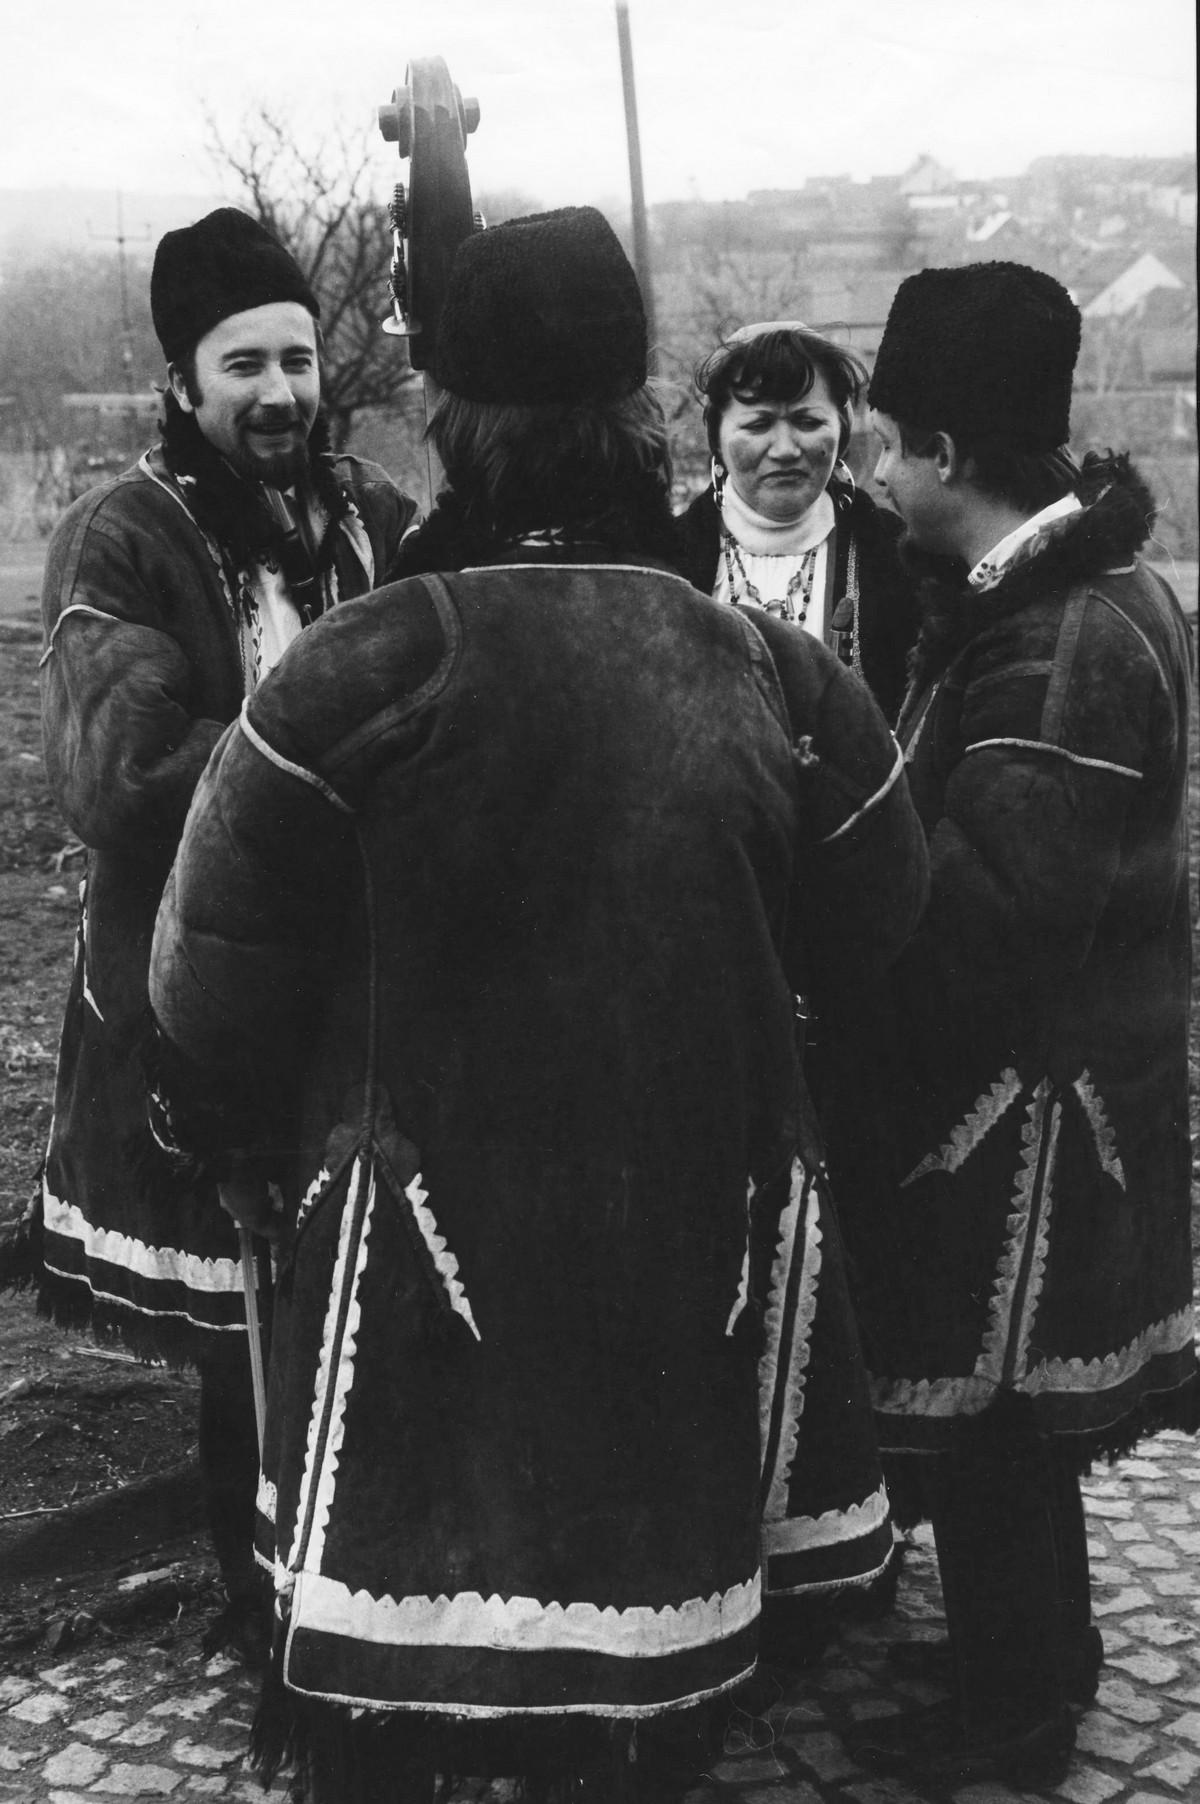 Fašank Ostrožská Lhota 1984